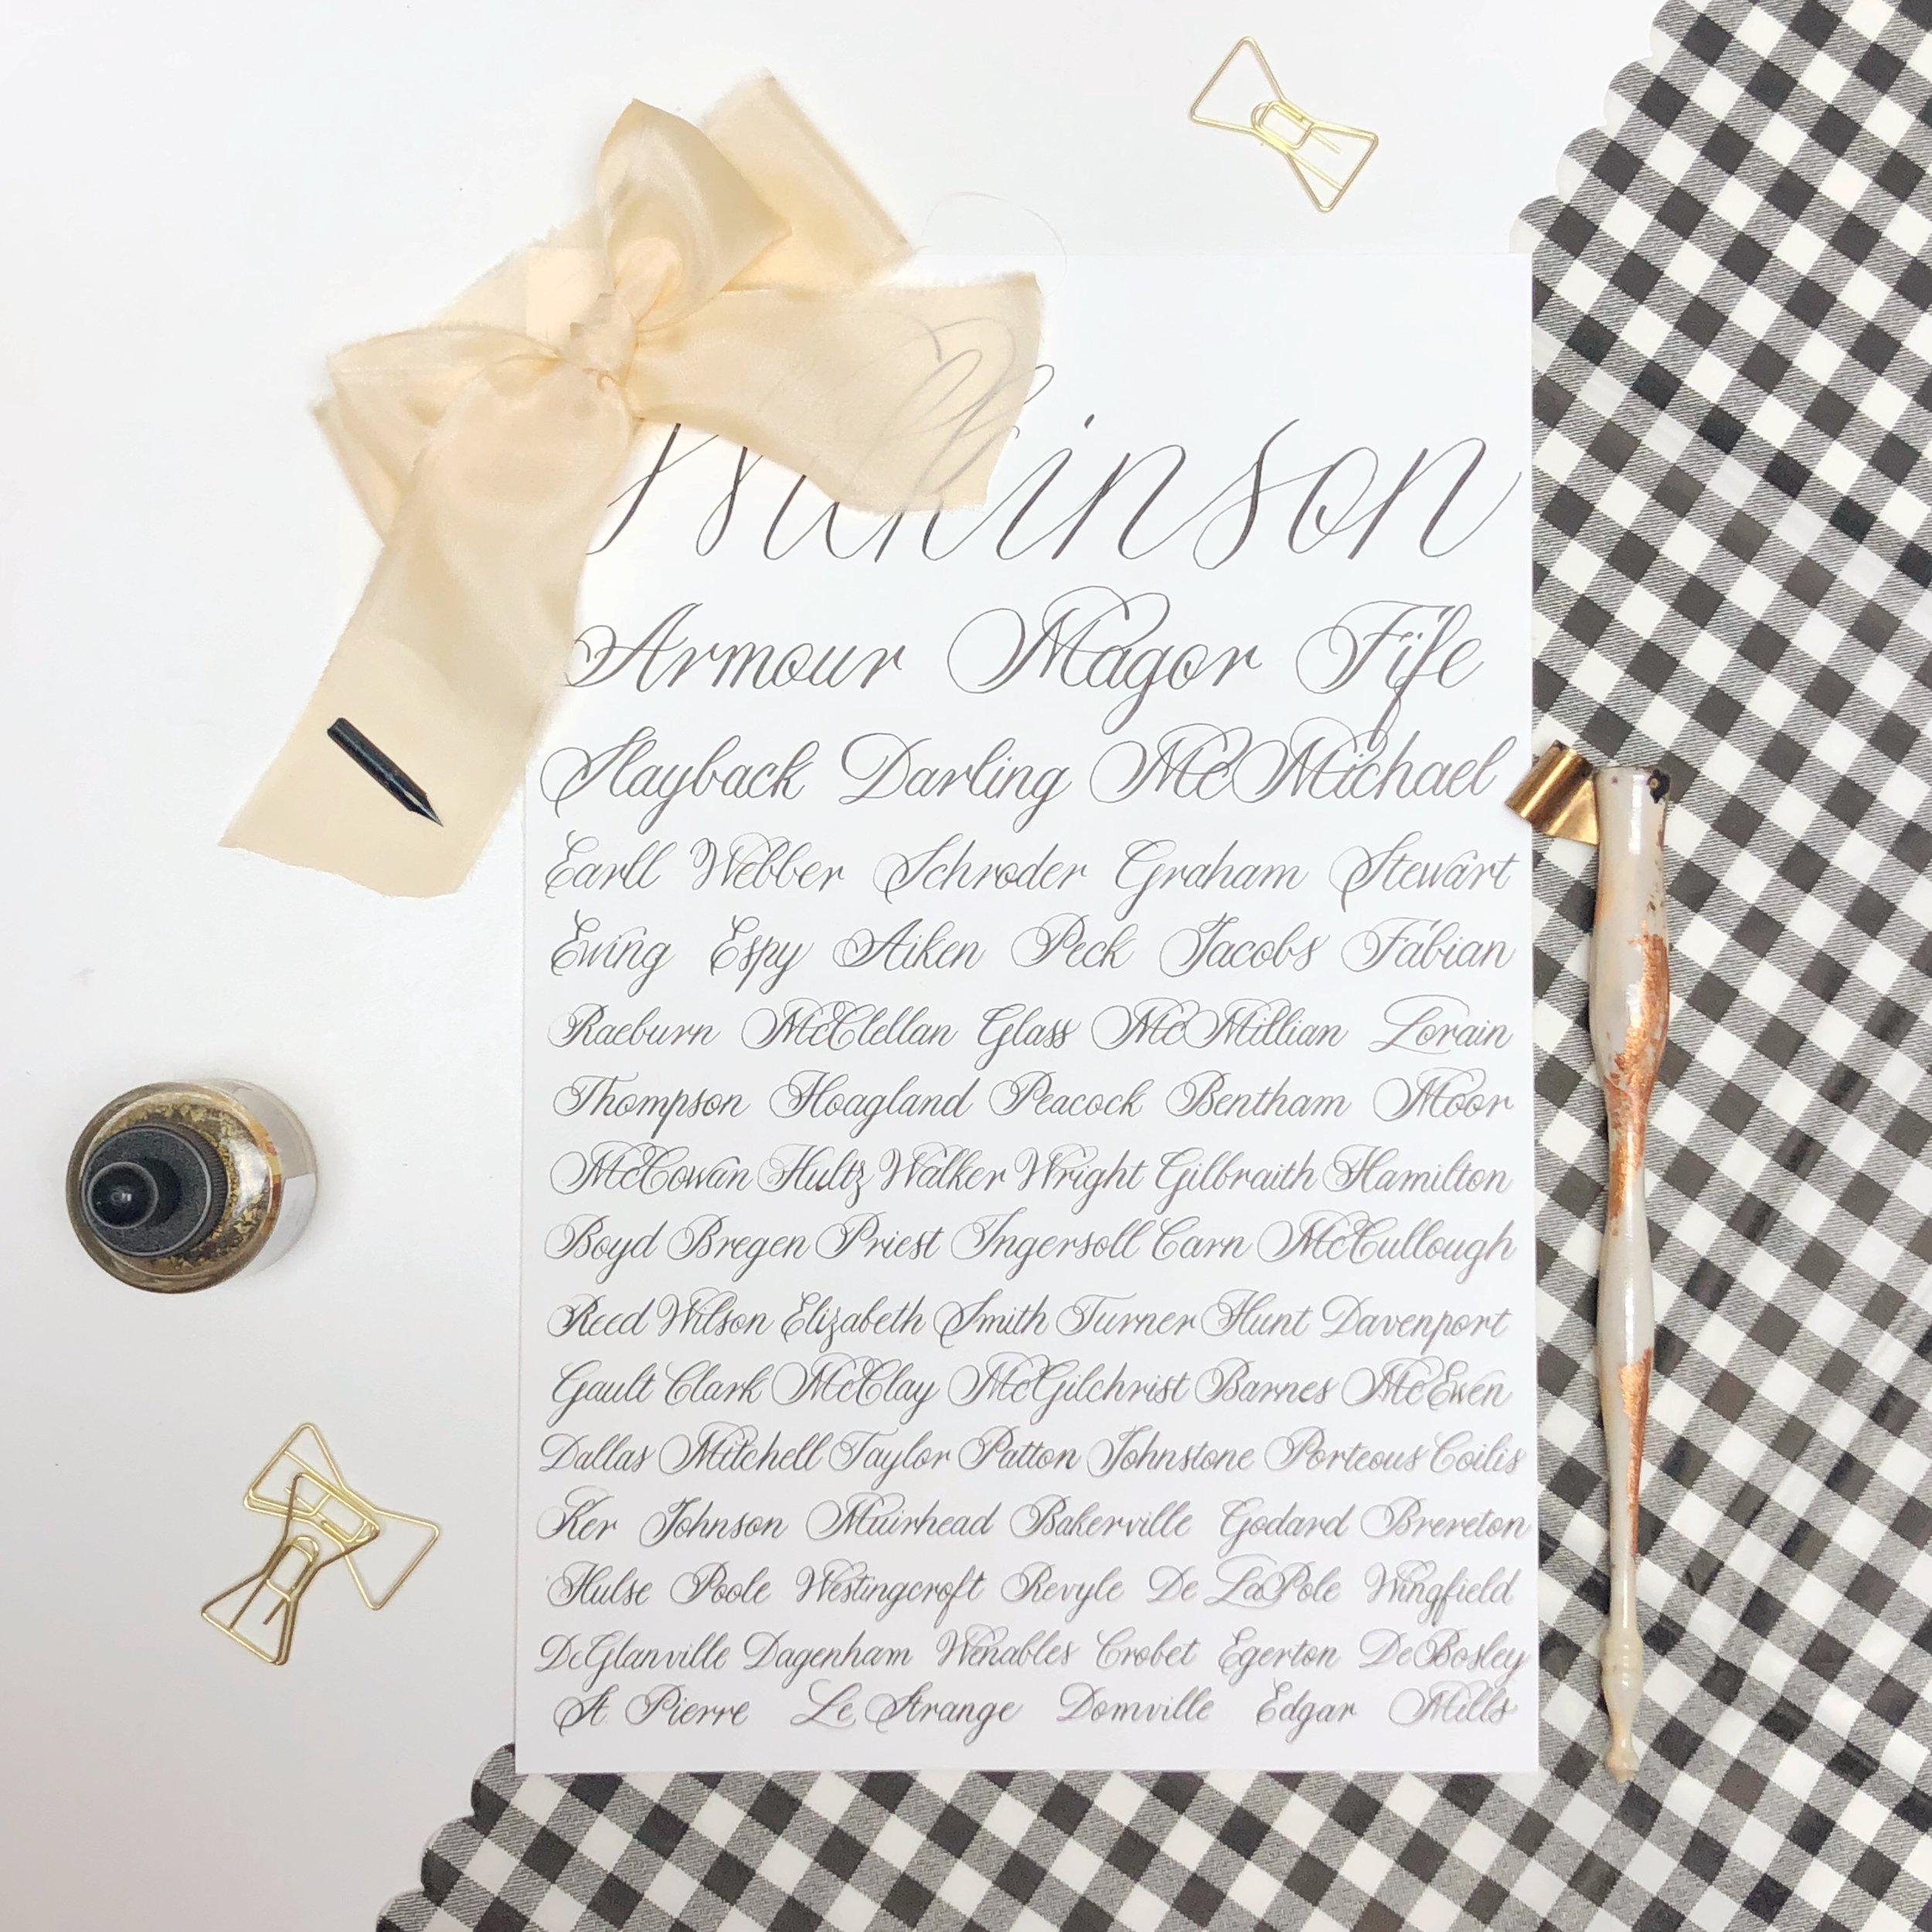 Central PA, York PA, JesSmith Designs, custom, wedding, invitations, bridal, Harrisburg, hanover, calligraphy, baltimore, wedding invitations, lancaster, gettysburg, 12-18 15.57.52.jpg